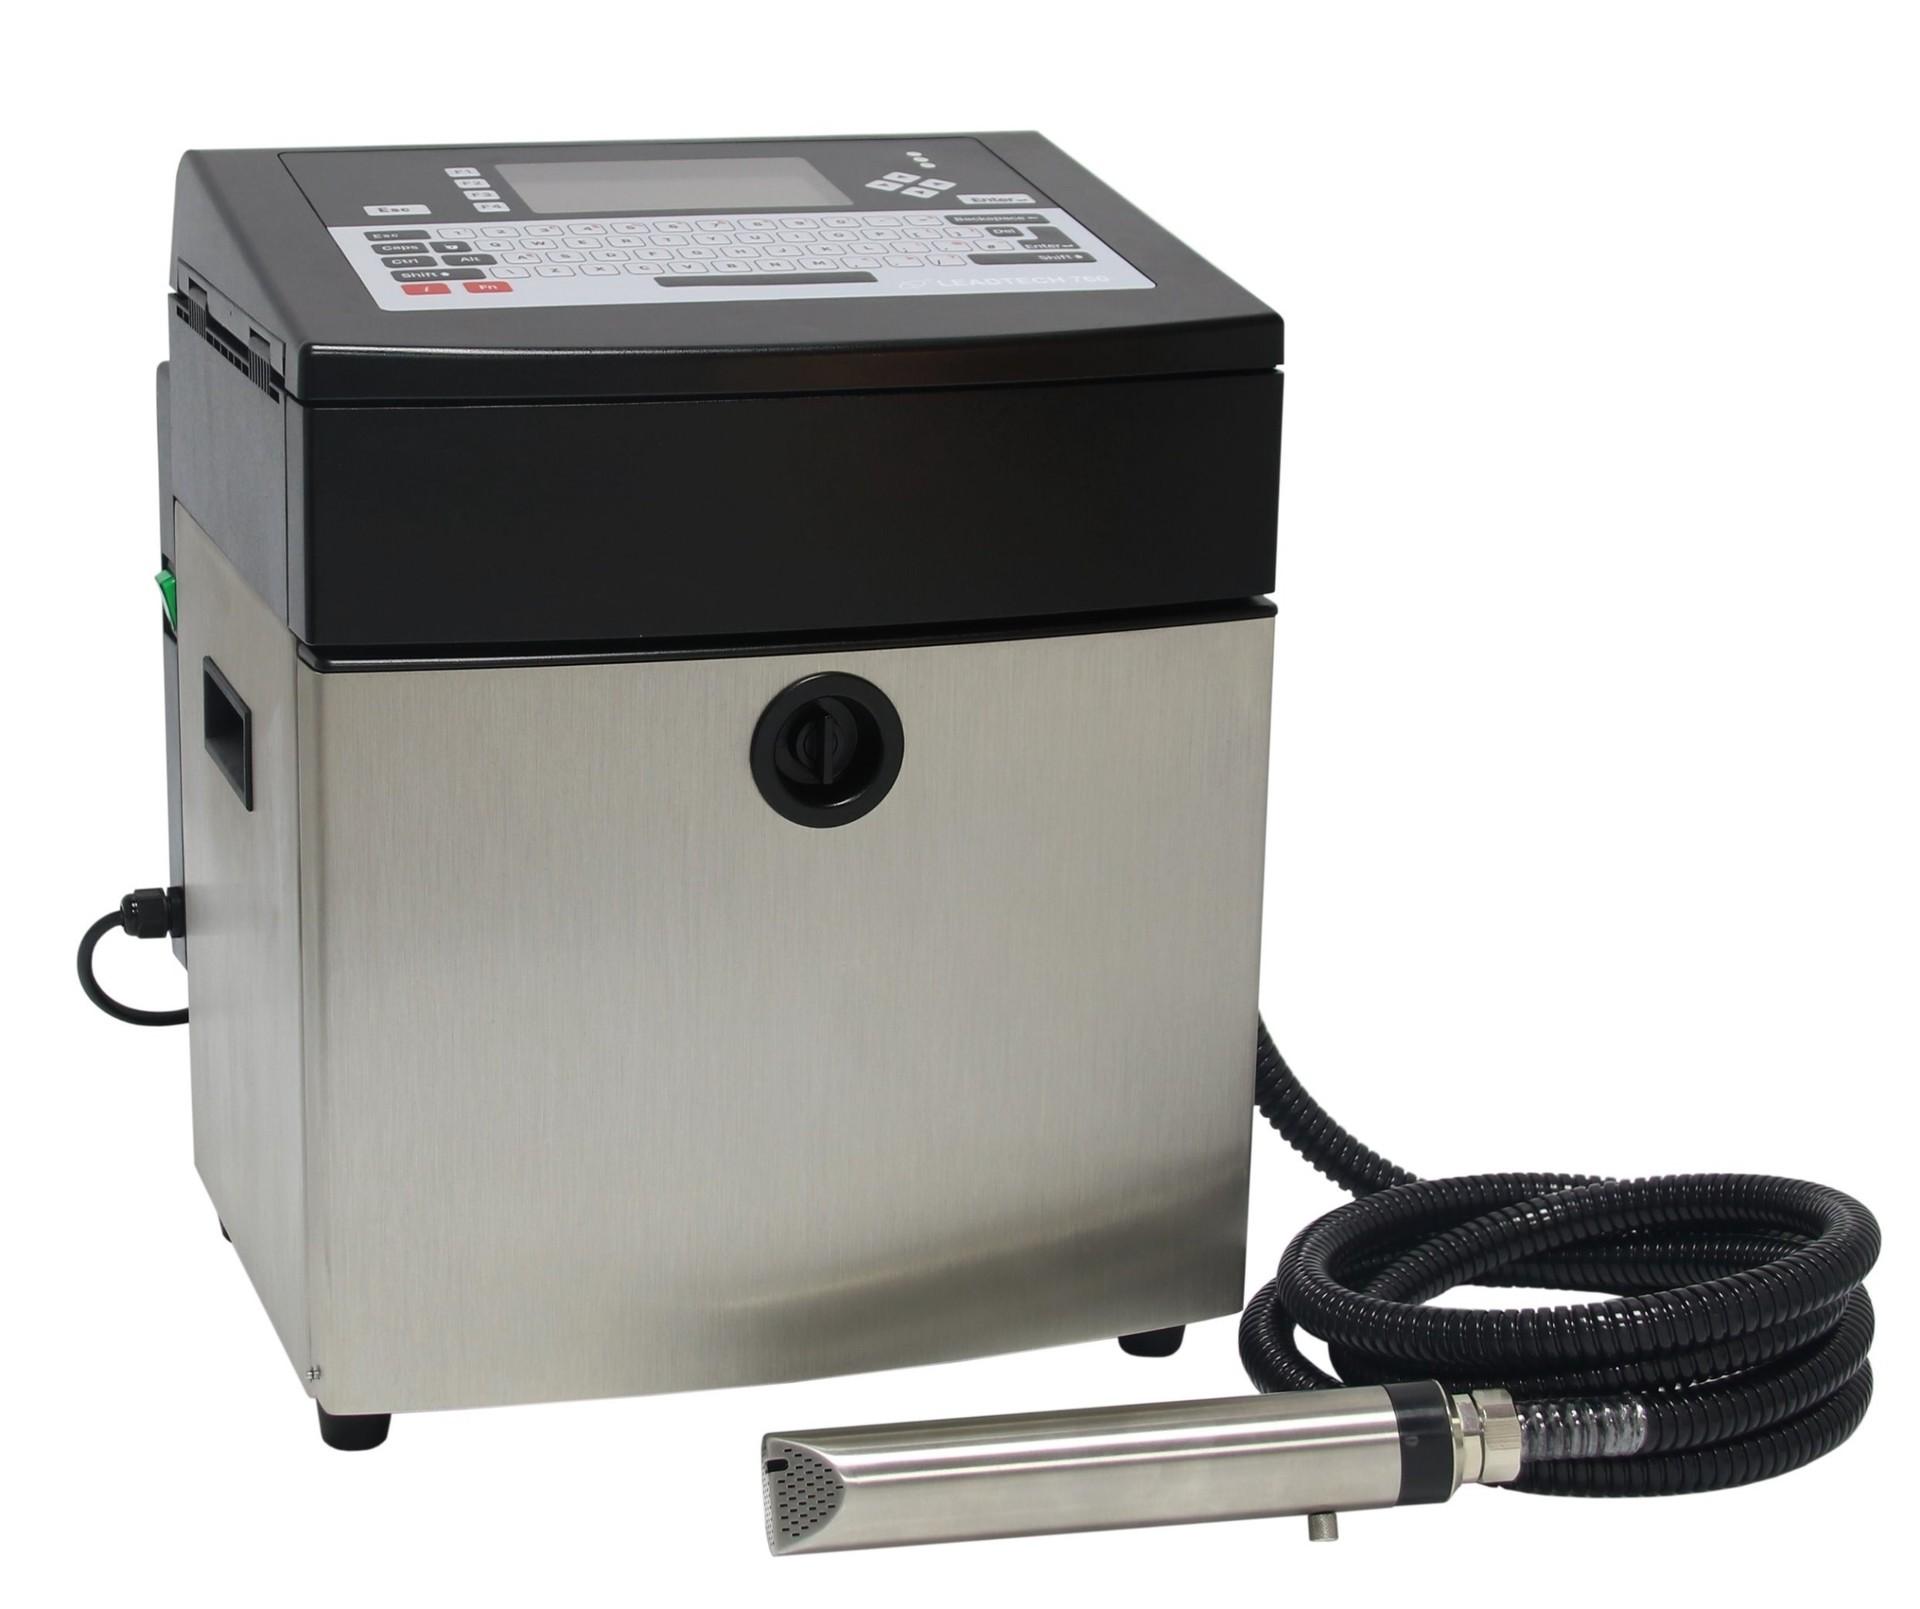 Lead Tech Lt760 Tuna Can Printing Inkjet Printer